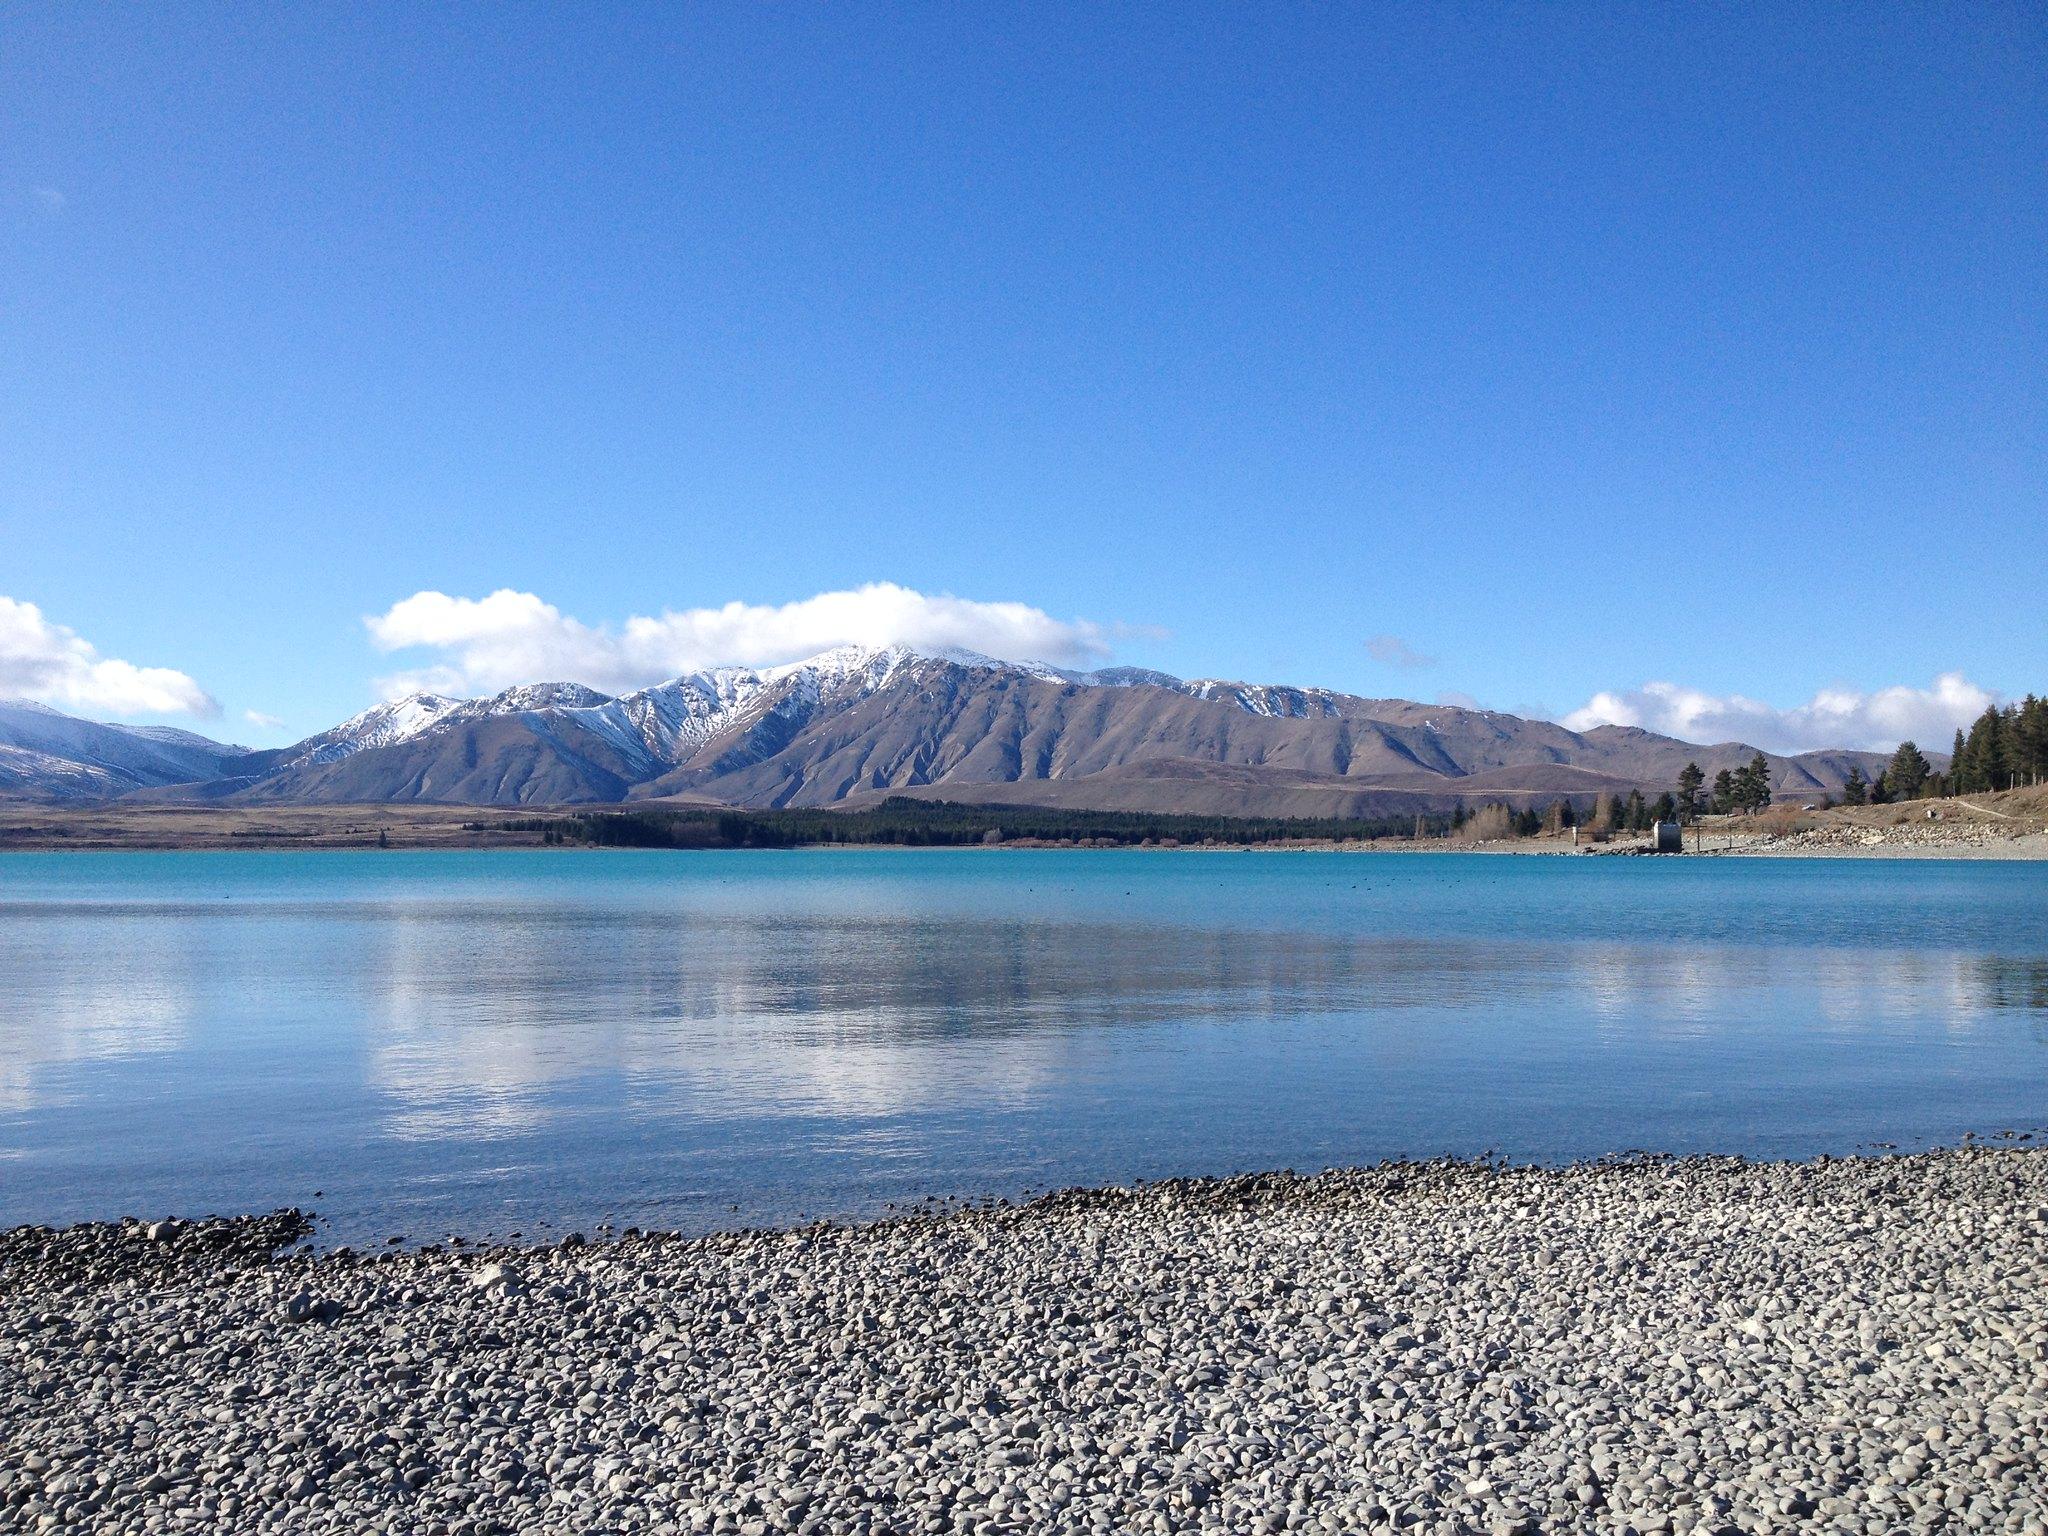 Gleaming Lake Tekapo